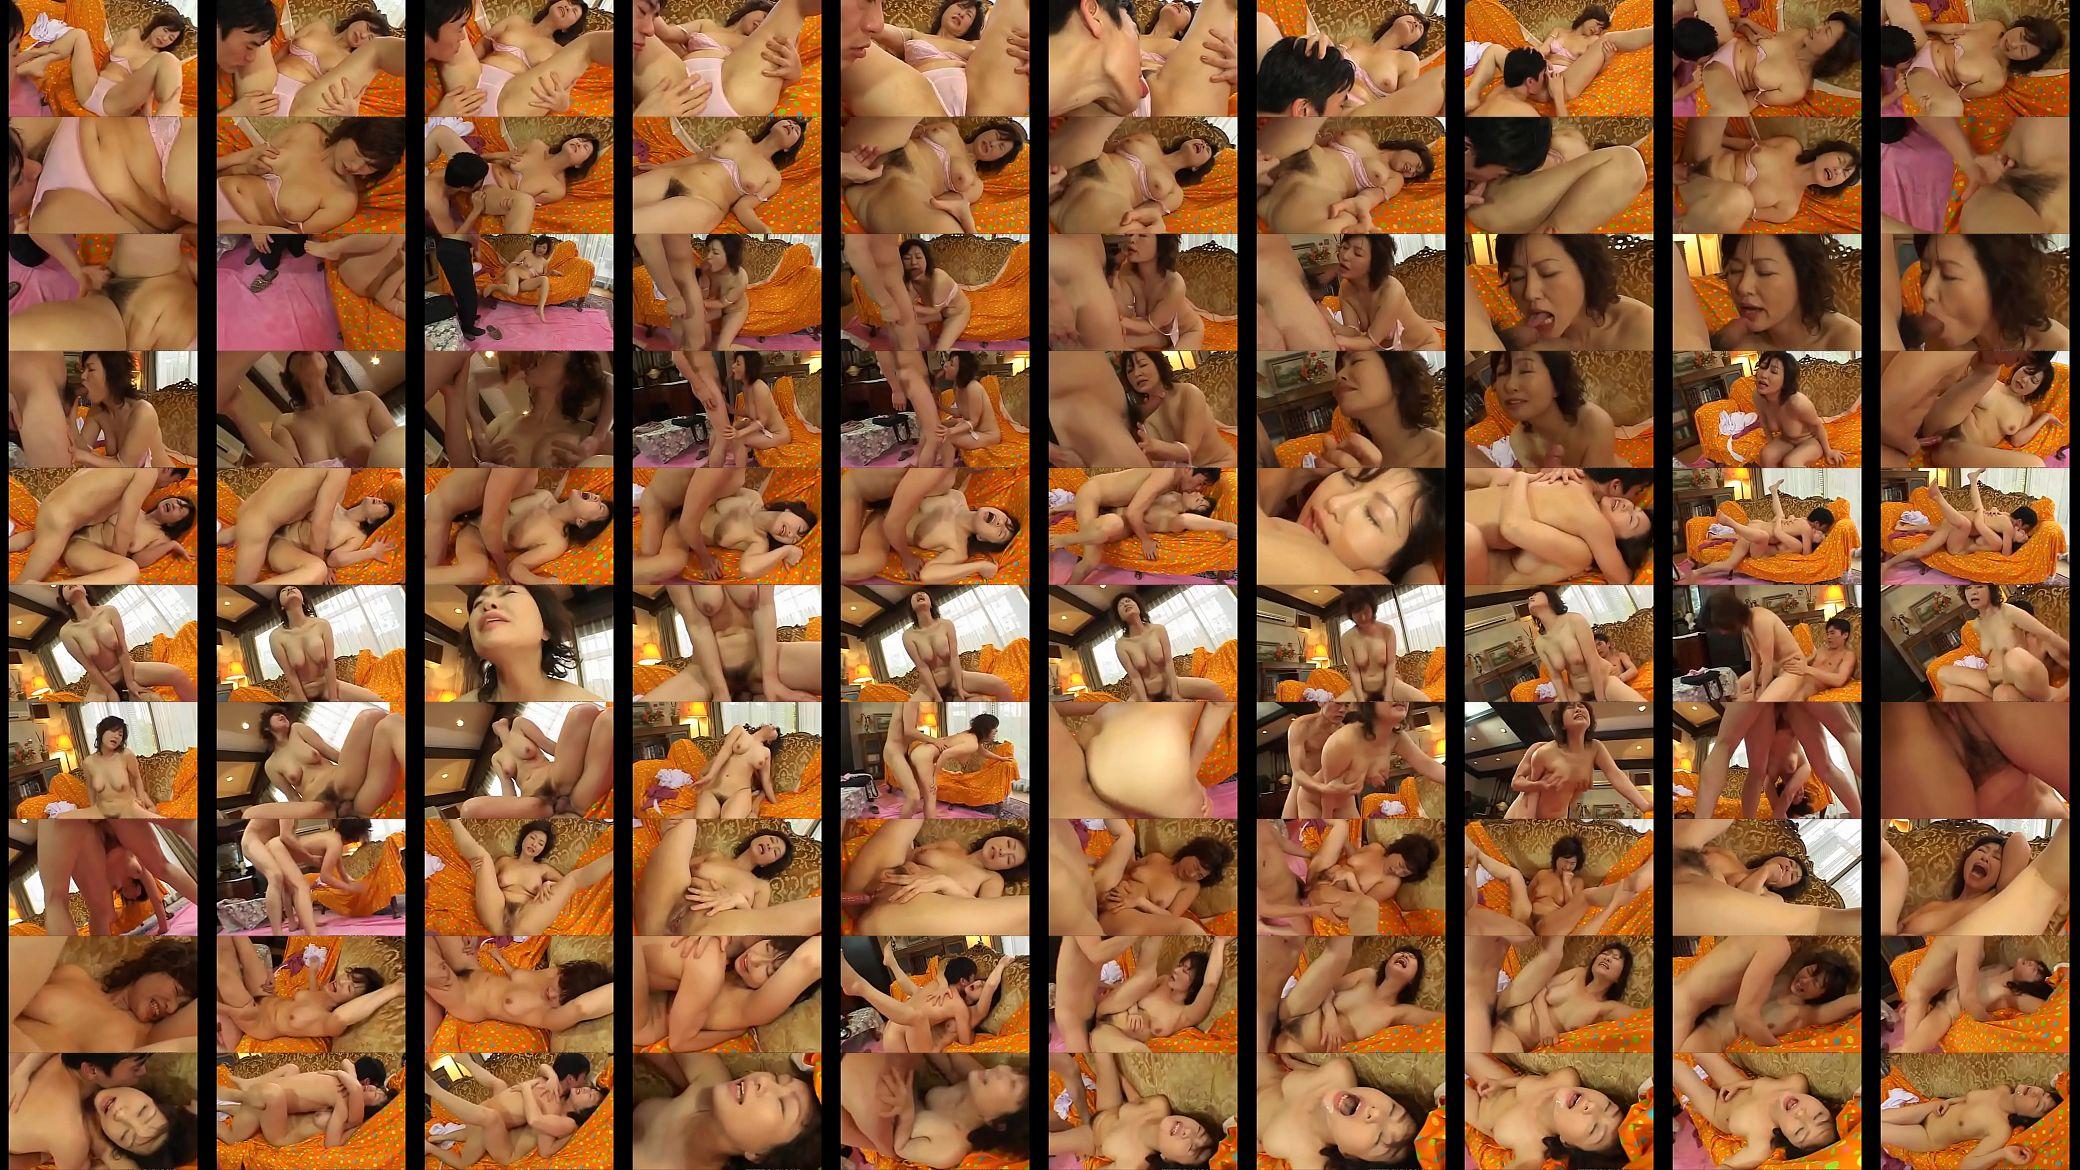 gif  pussy JAPANpornhub japan gif 無修正 gif pornフェラ japangifフェラ gilrs sex japan投稿画像201枚